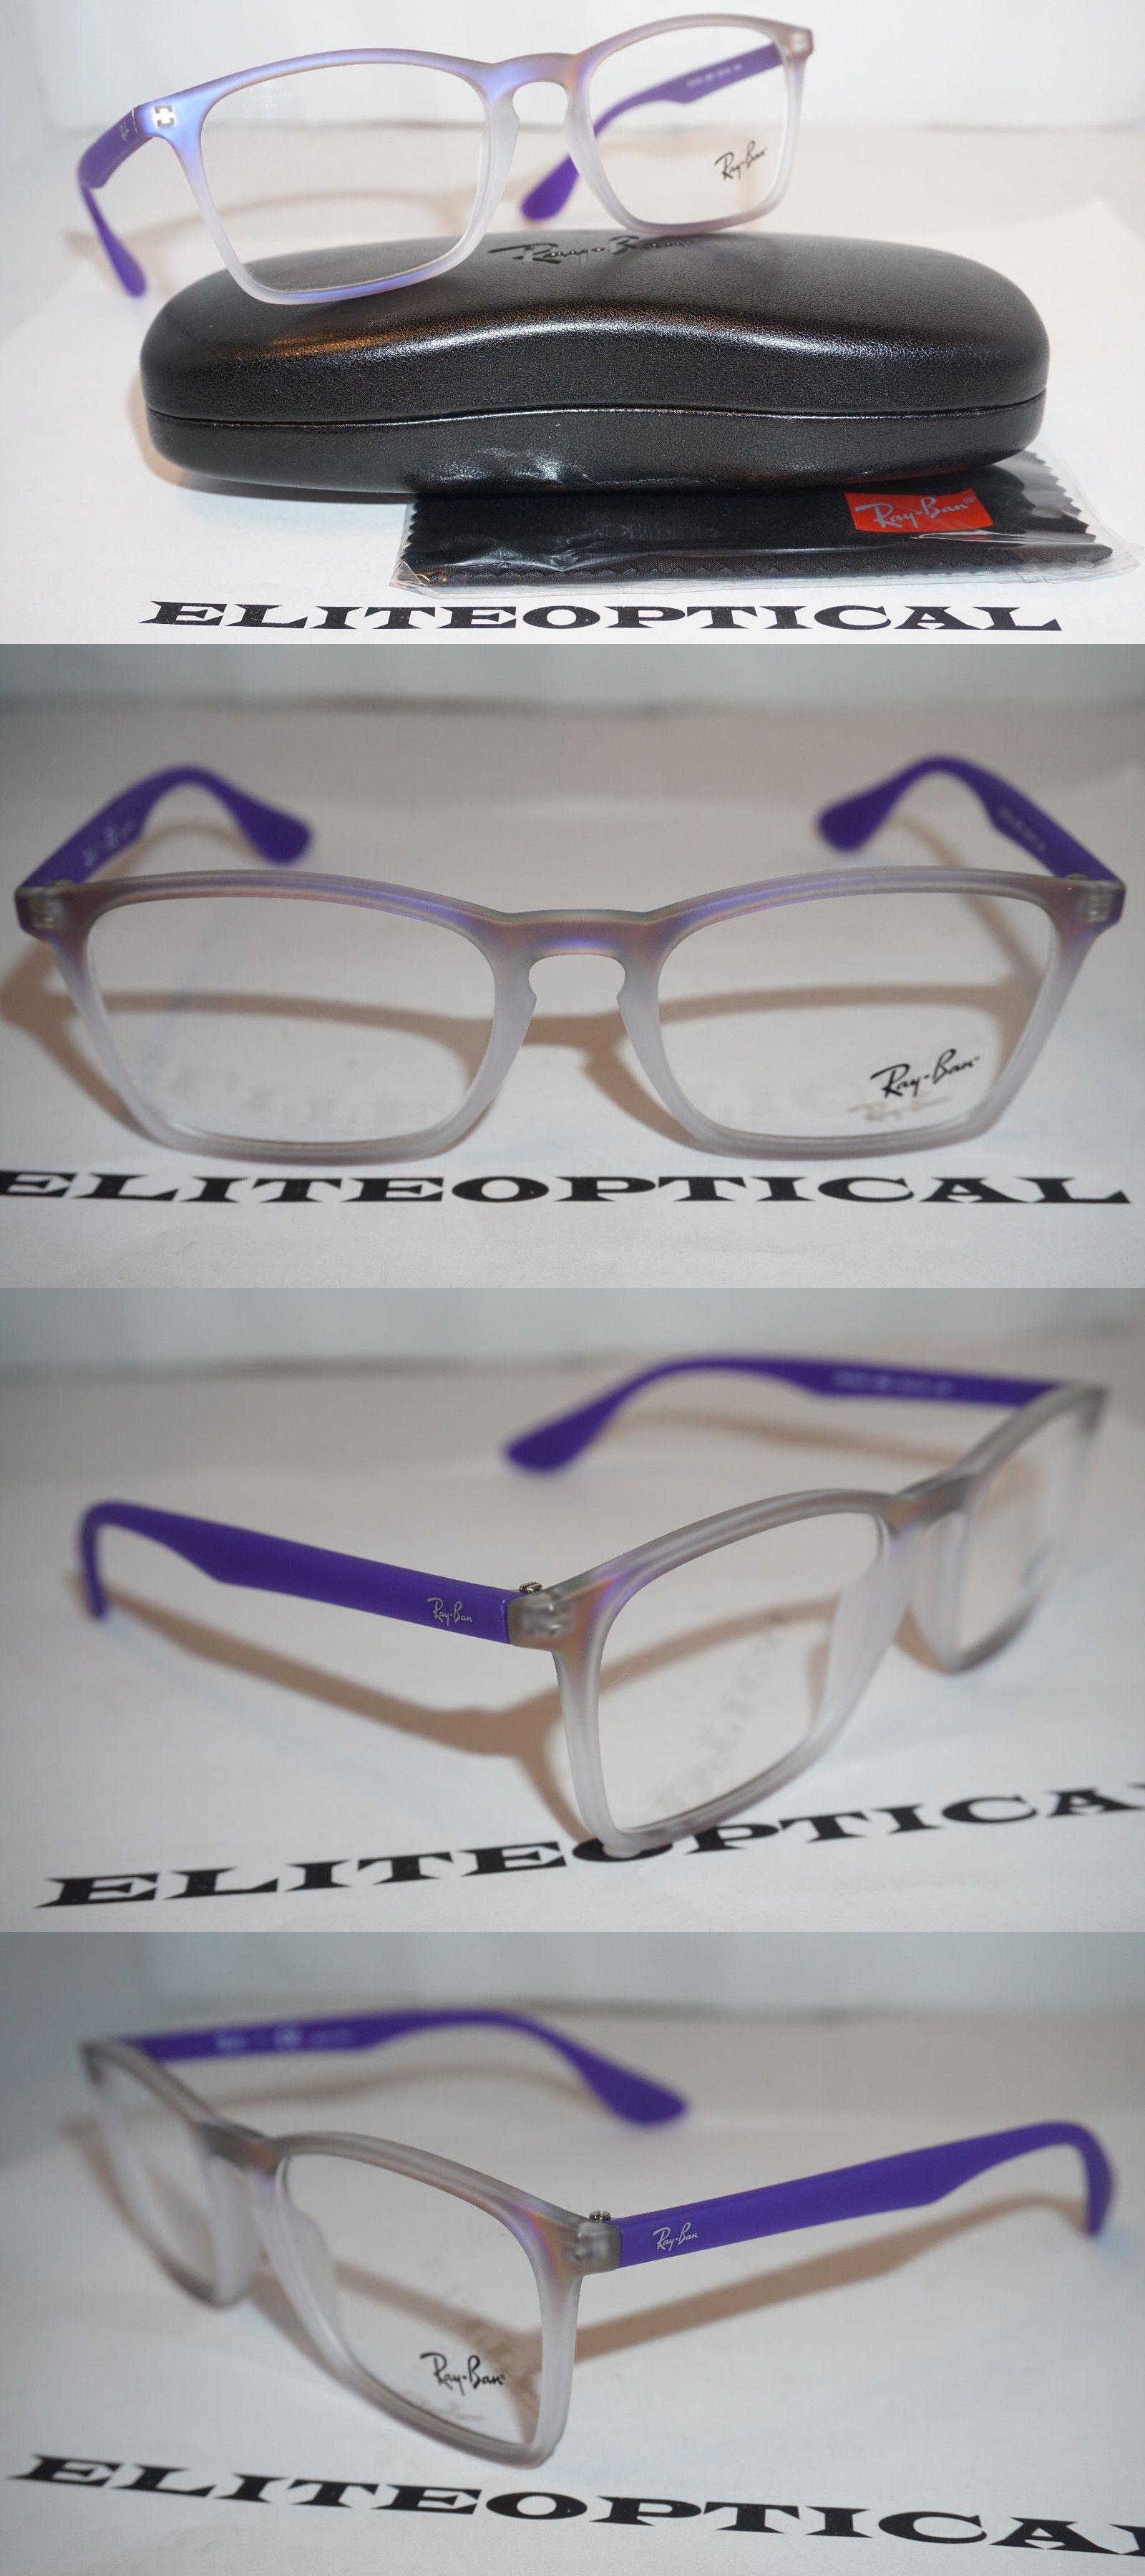 05dcde1c3f8 Eyeglass Frames  New Authentic Ray Ban Eyeglasses Iridescent Purple Rb7045  5600 53 18 140 -